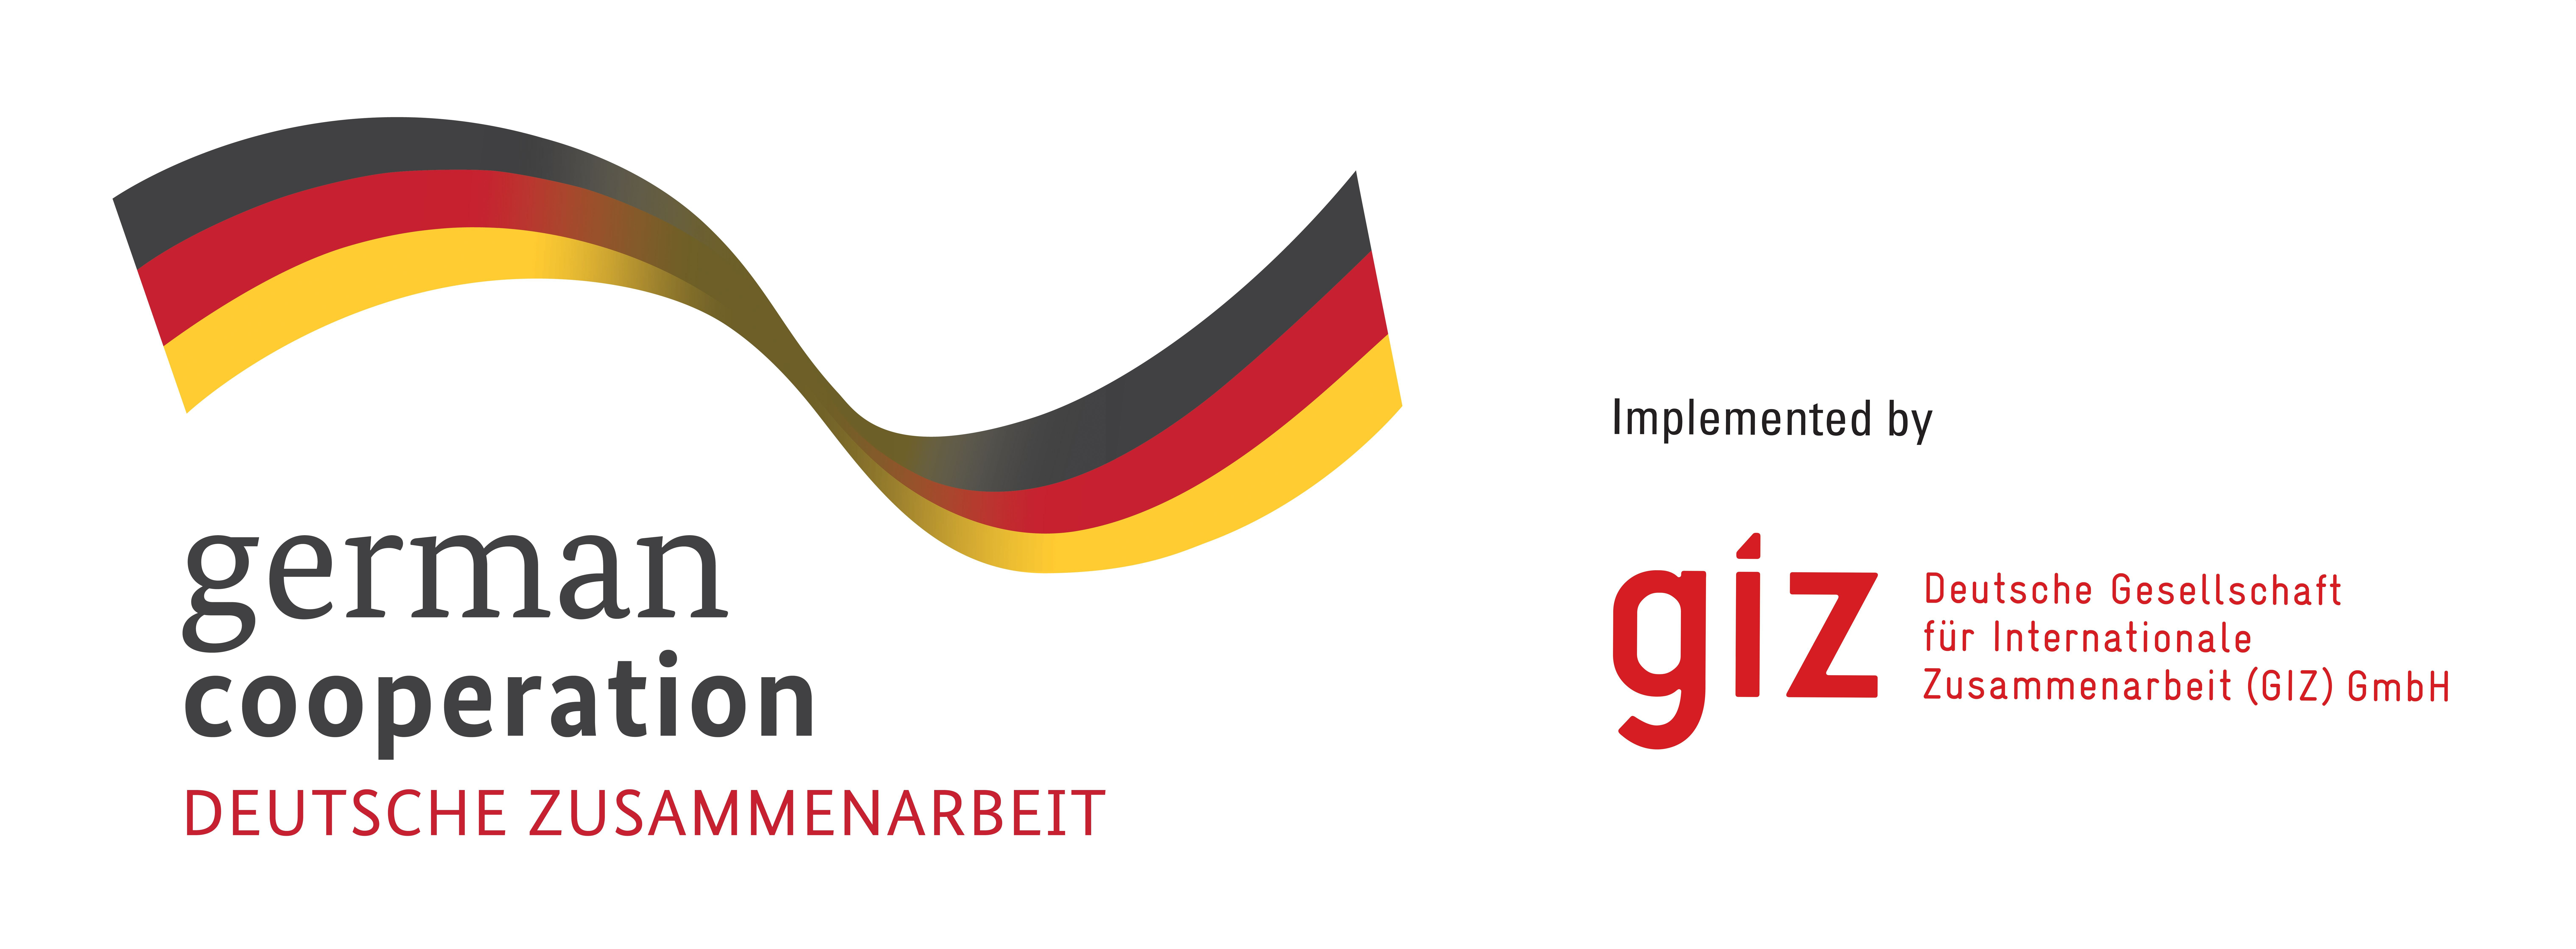 ger-coop-giz-implemented-logo_002.jpg